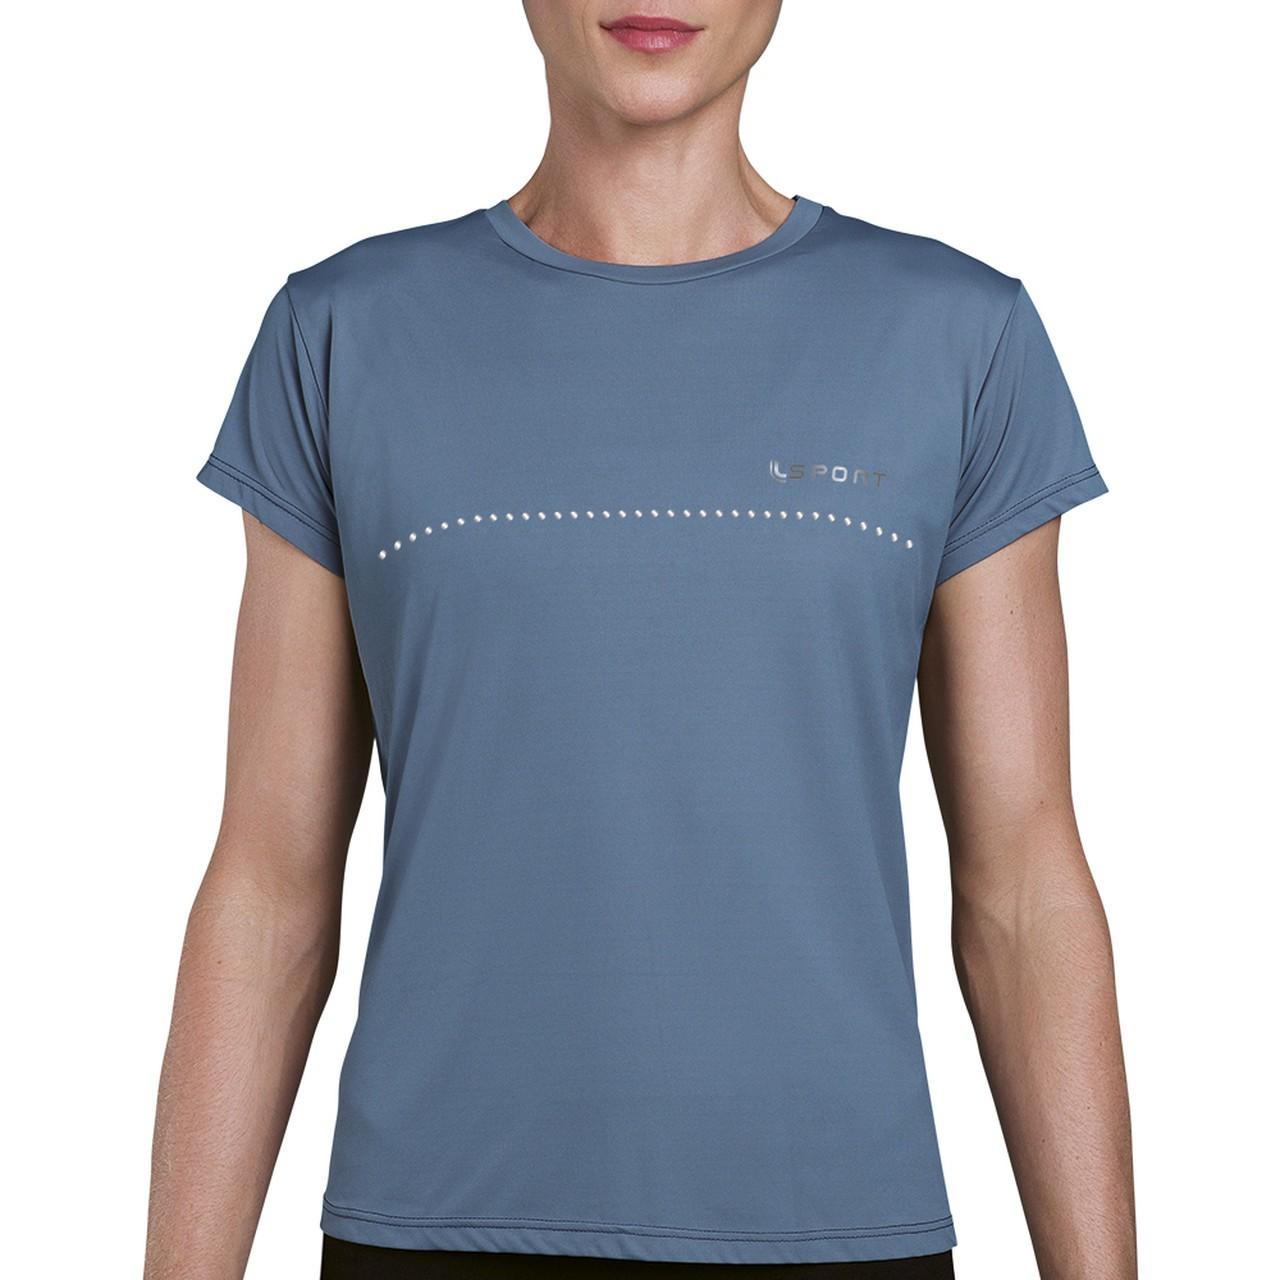 Camiseta sportiva basica feminina academia caminhada lupo